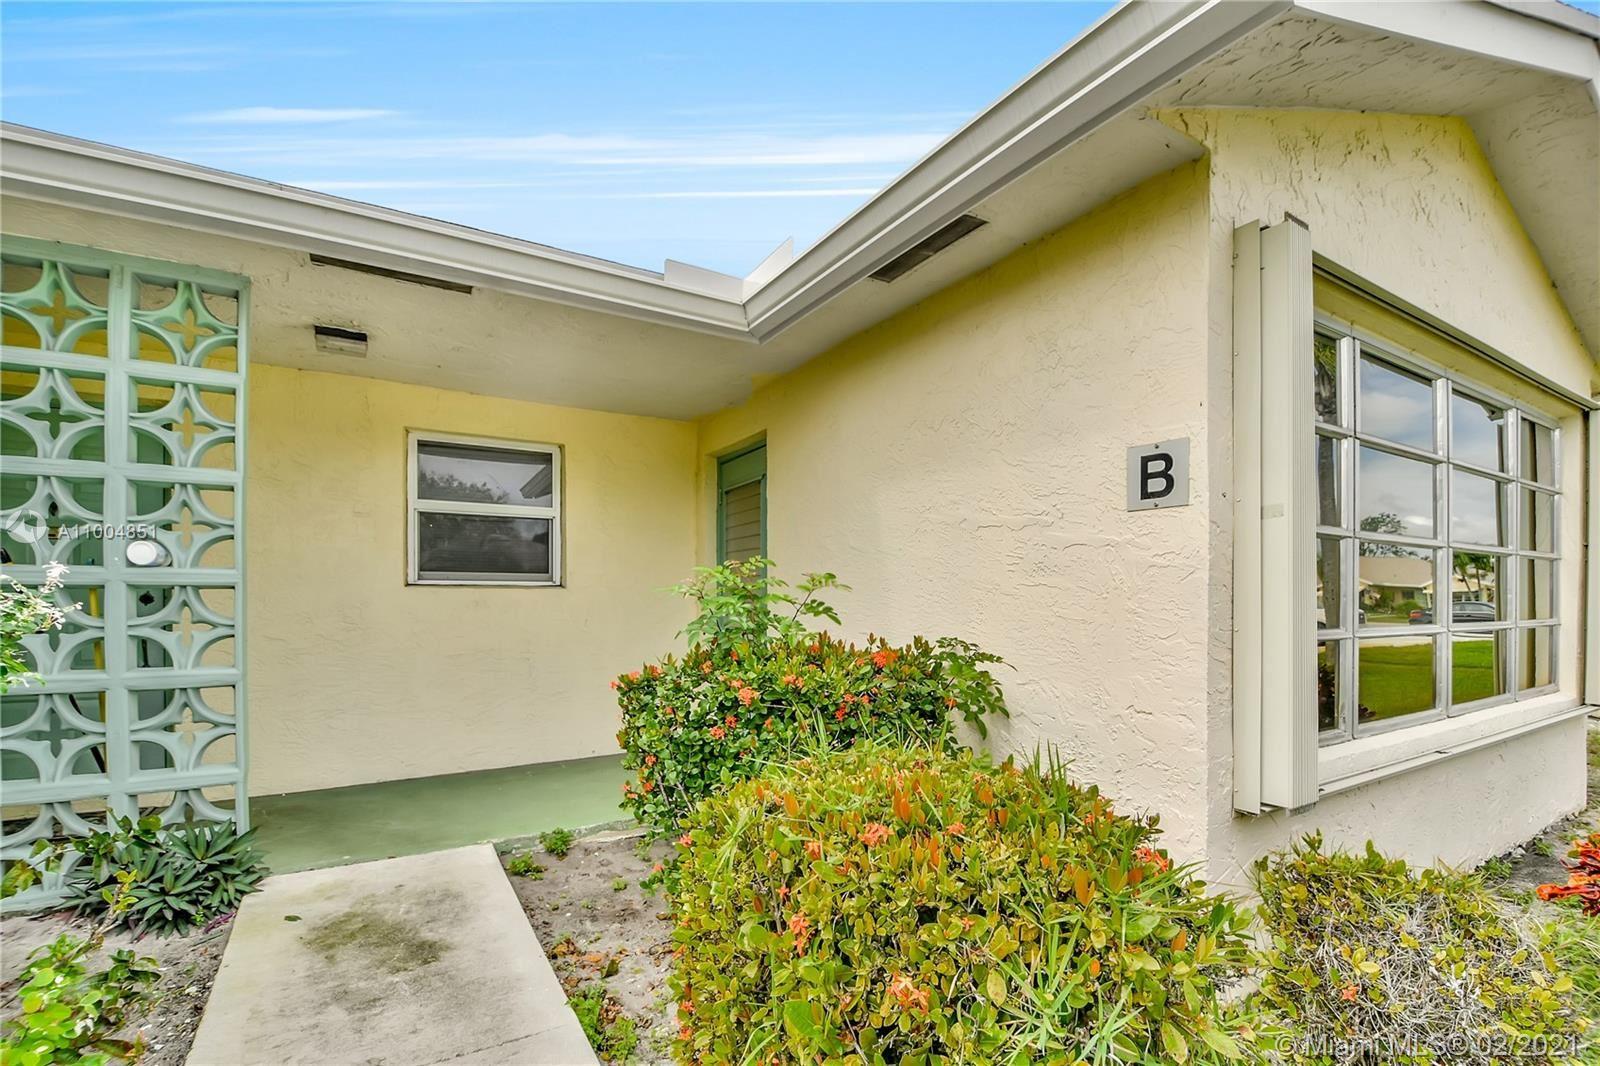 Photo of 5392 Lakefront Blvd #B, Delray Beach, FL 33484 (MLS # A11004851)